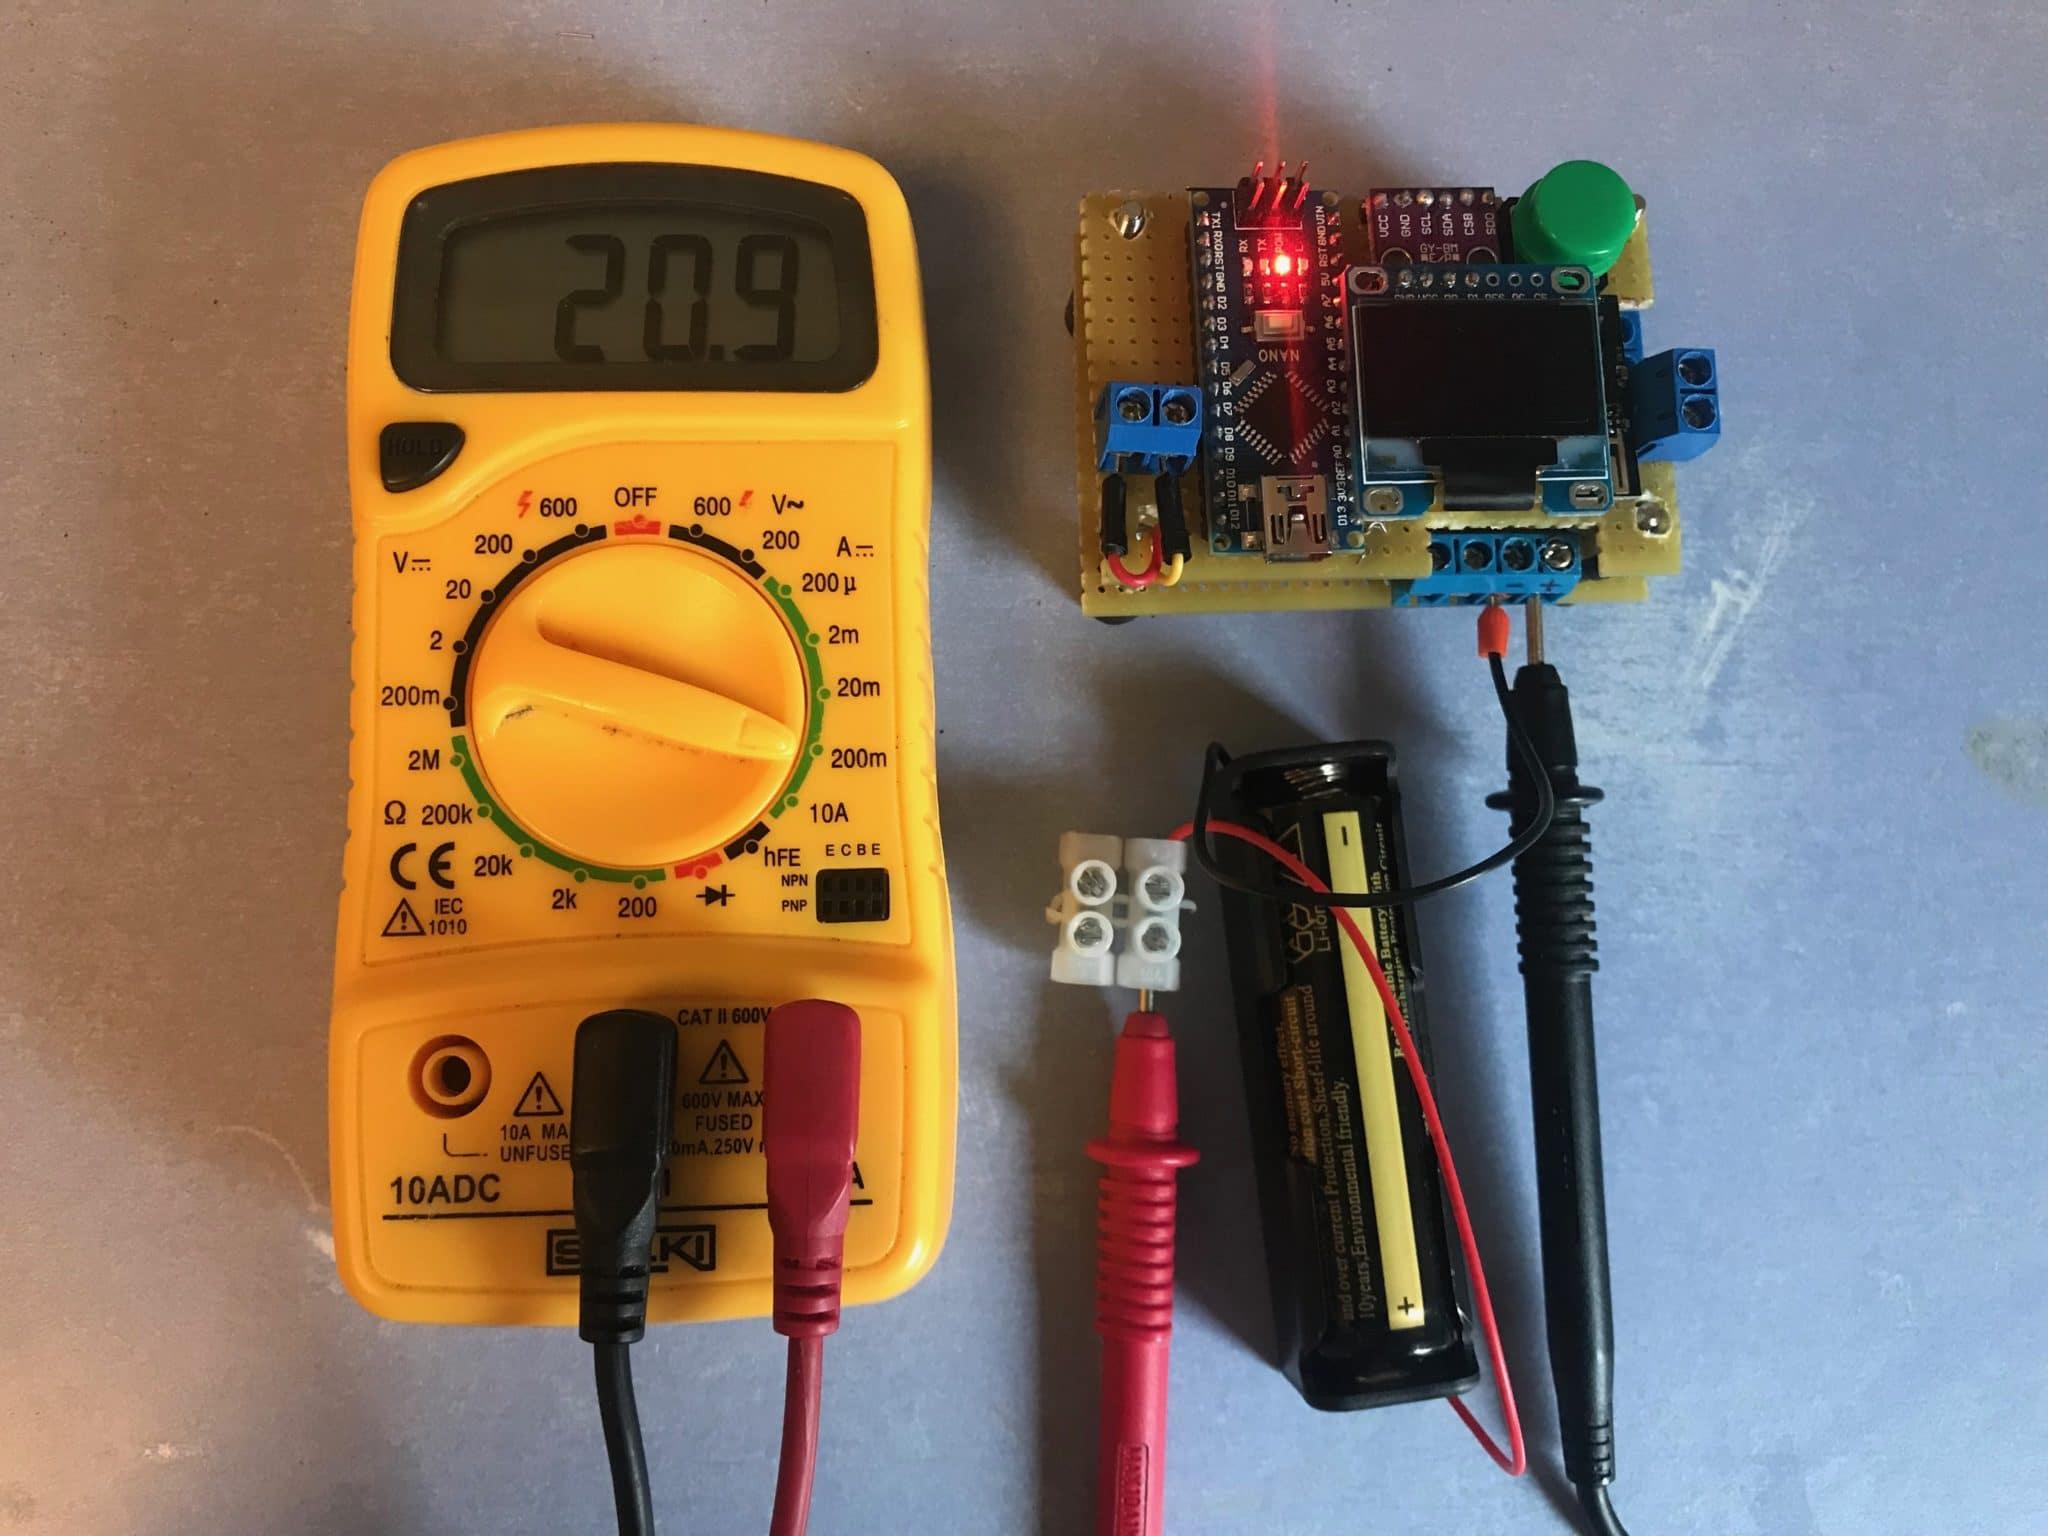 Estación meteorológica WIFI. Arduino + ESP8266-01 + ThingsPeak.com   Módulo ESP8266-01